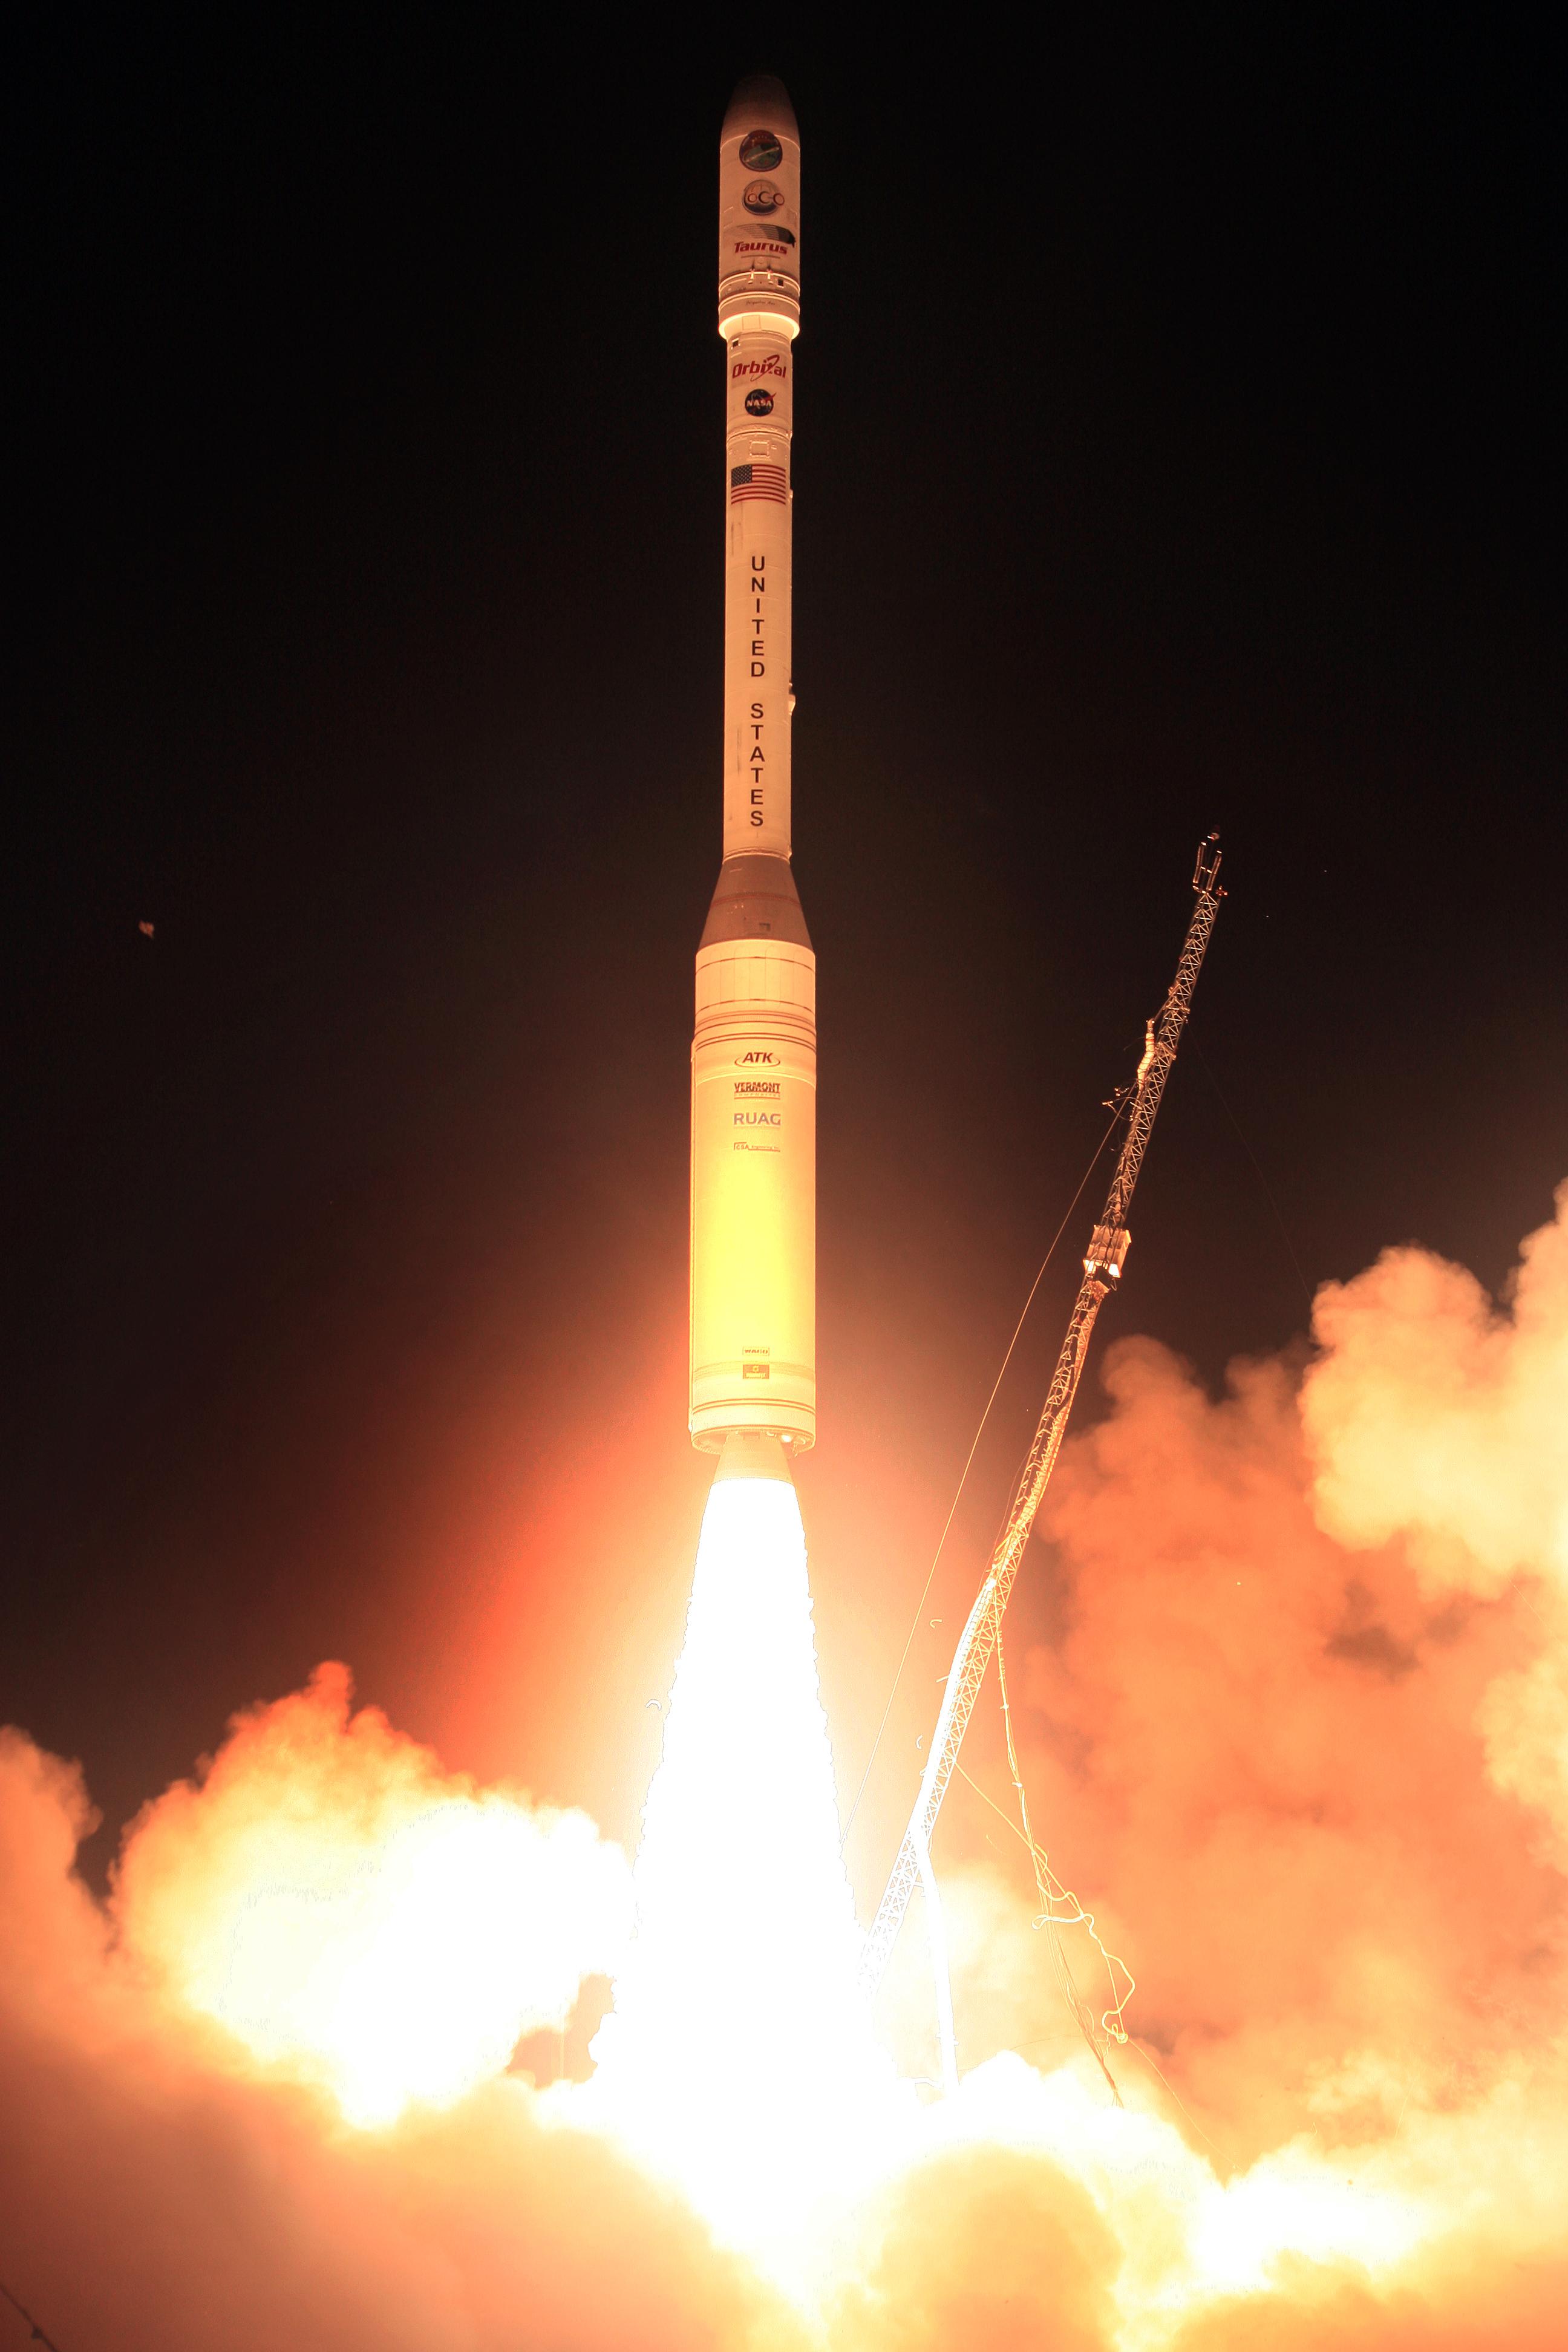 nasa rocket failure - photo #23